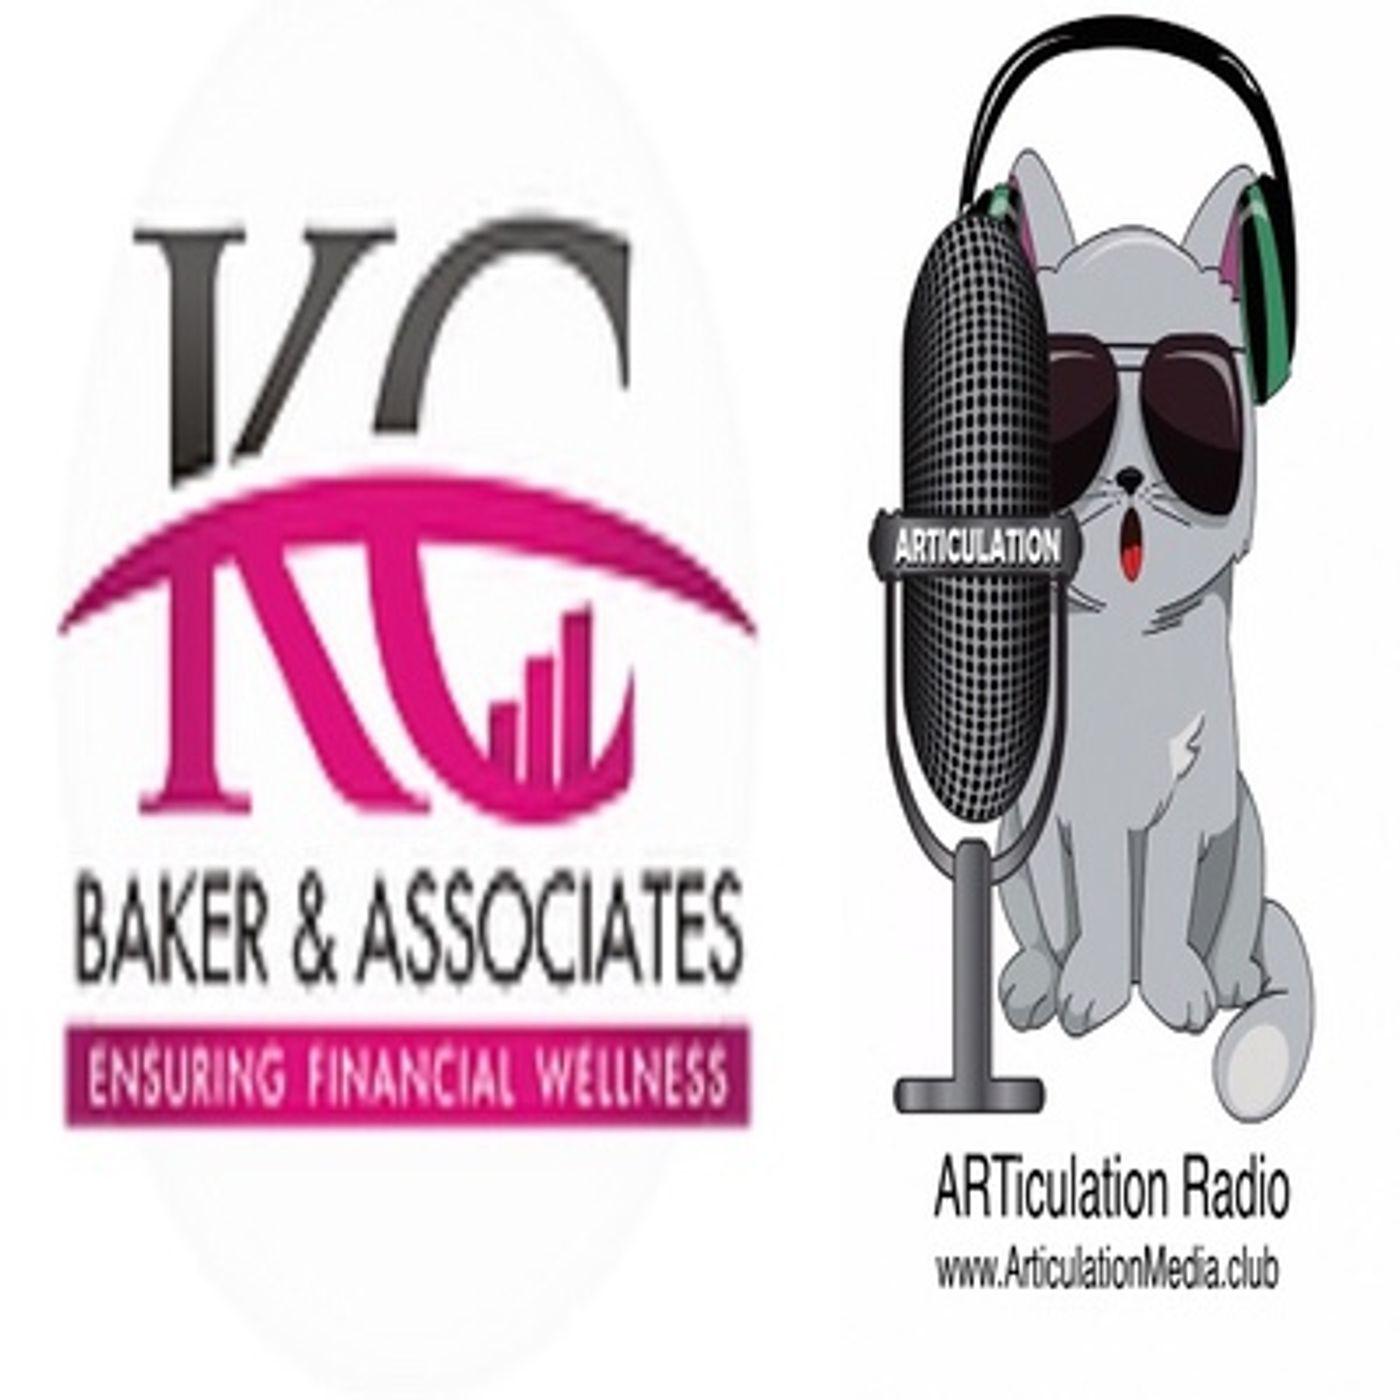 ARTiculation Radio — SECURING FINANCIAL WELL-BEING (interview w/ Karen Baker)